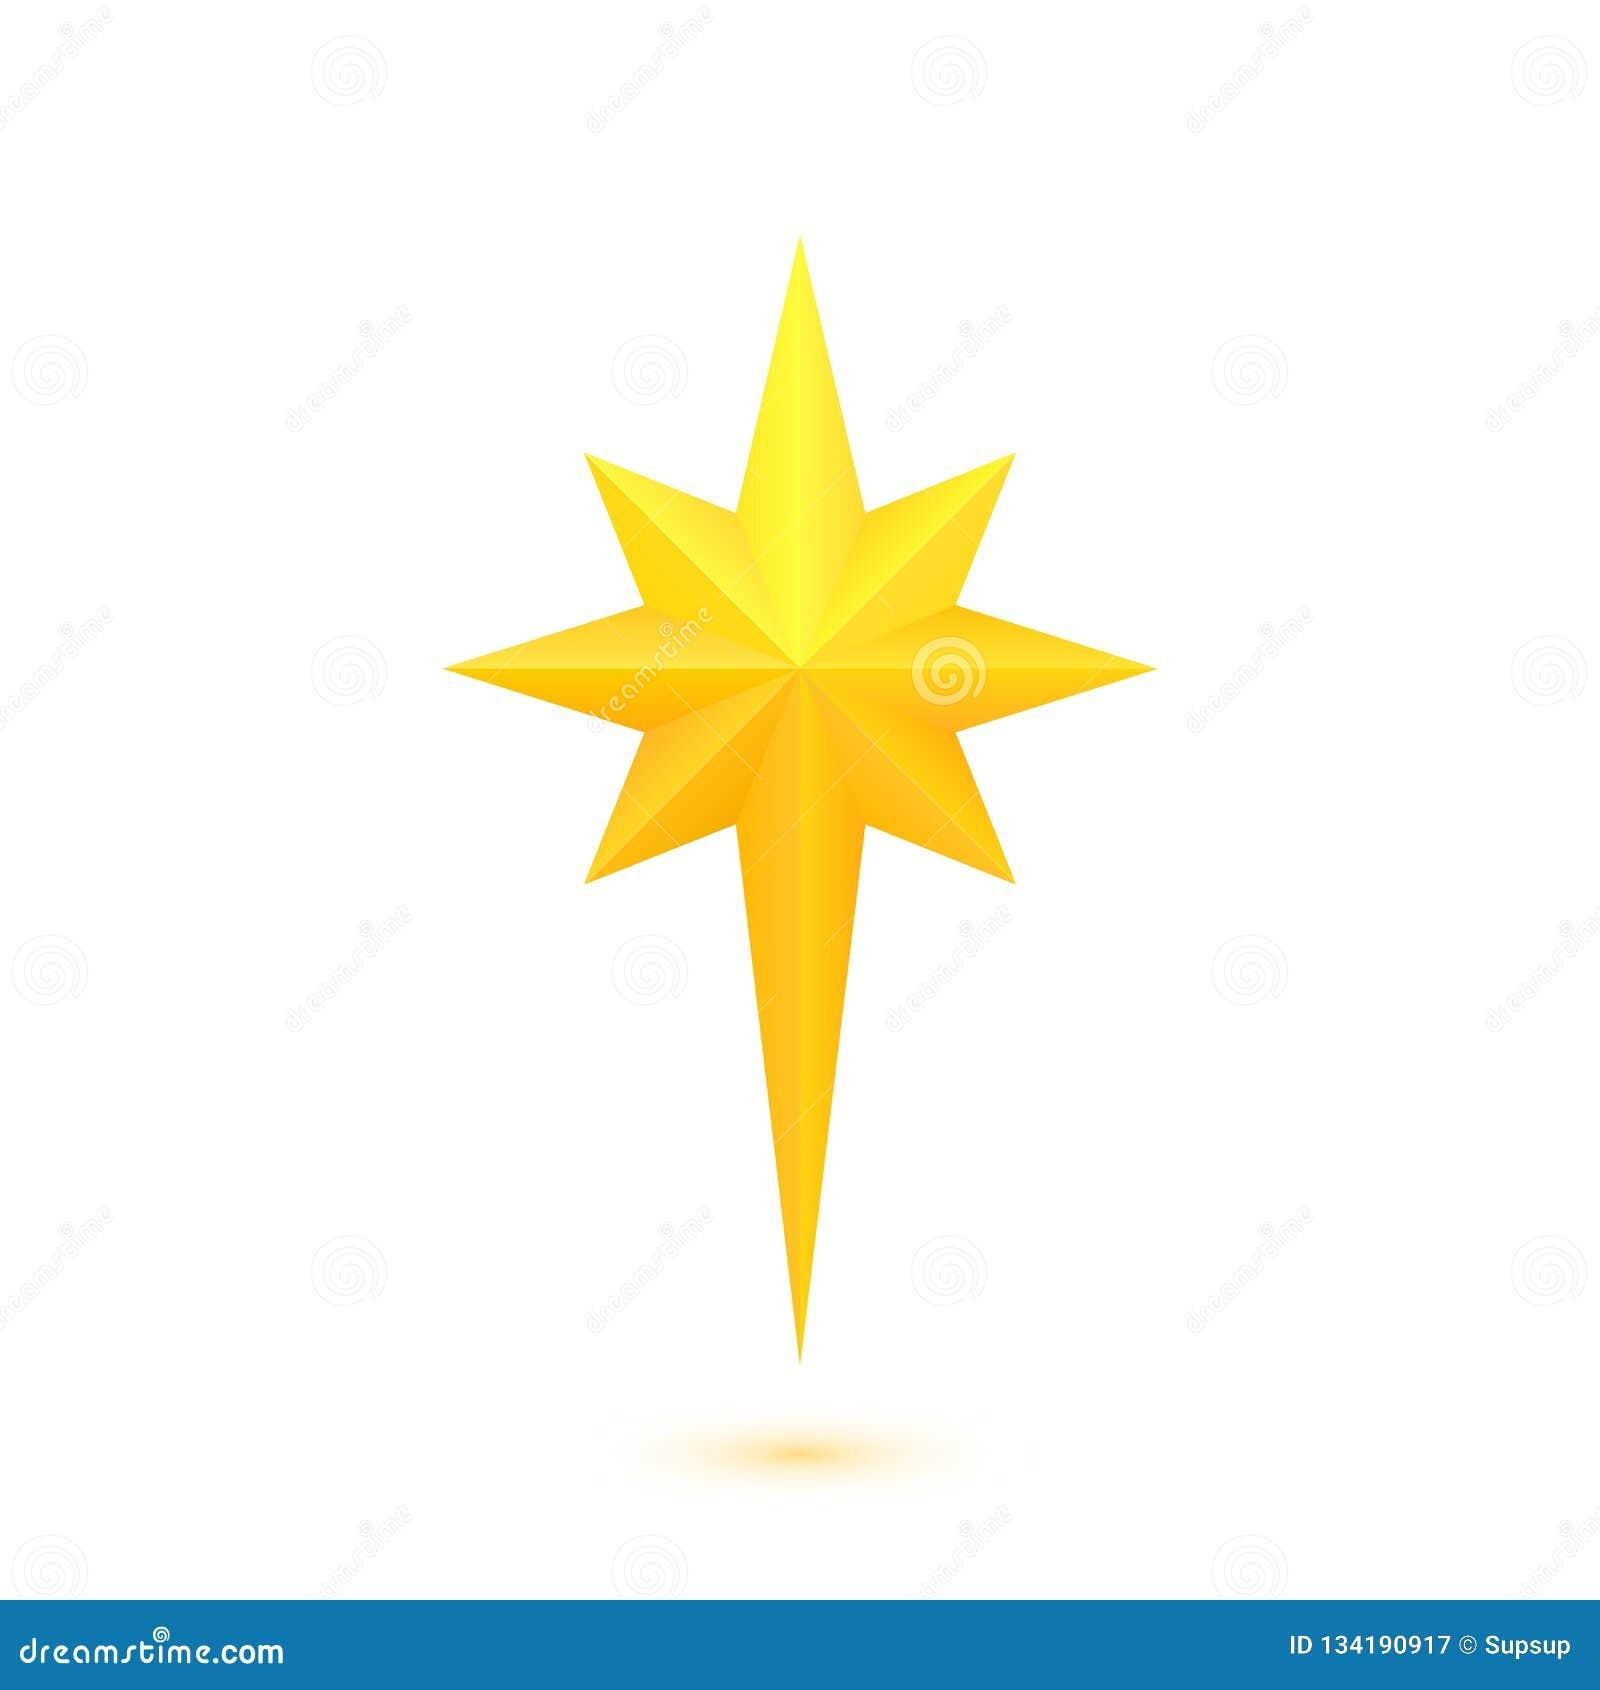 Christmas Star Images Clip Art.Bright Golden Christmas Star Stock Vector Illustration Of